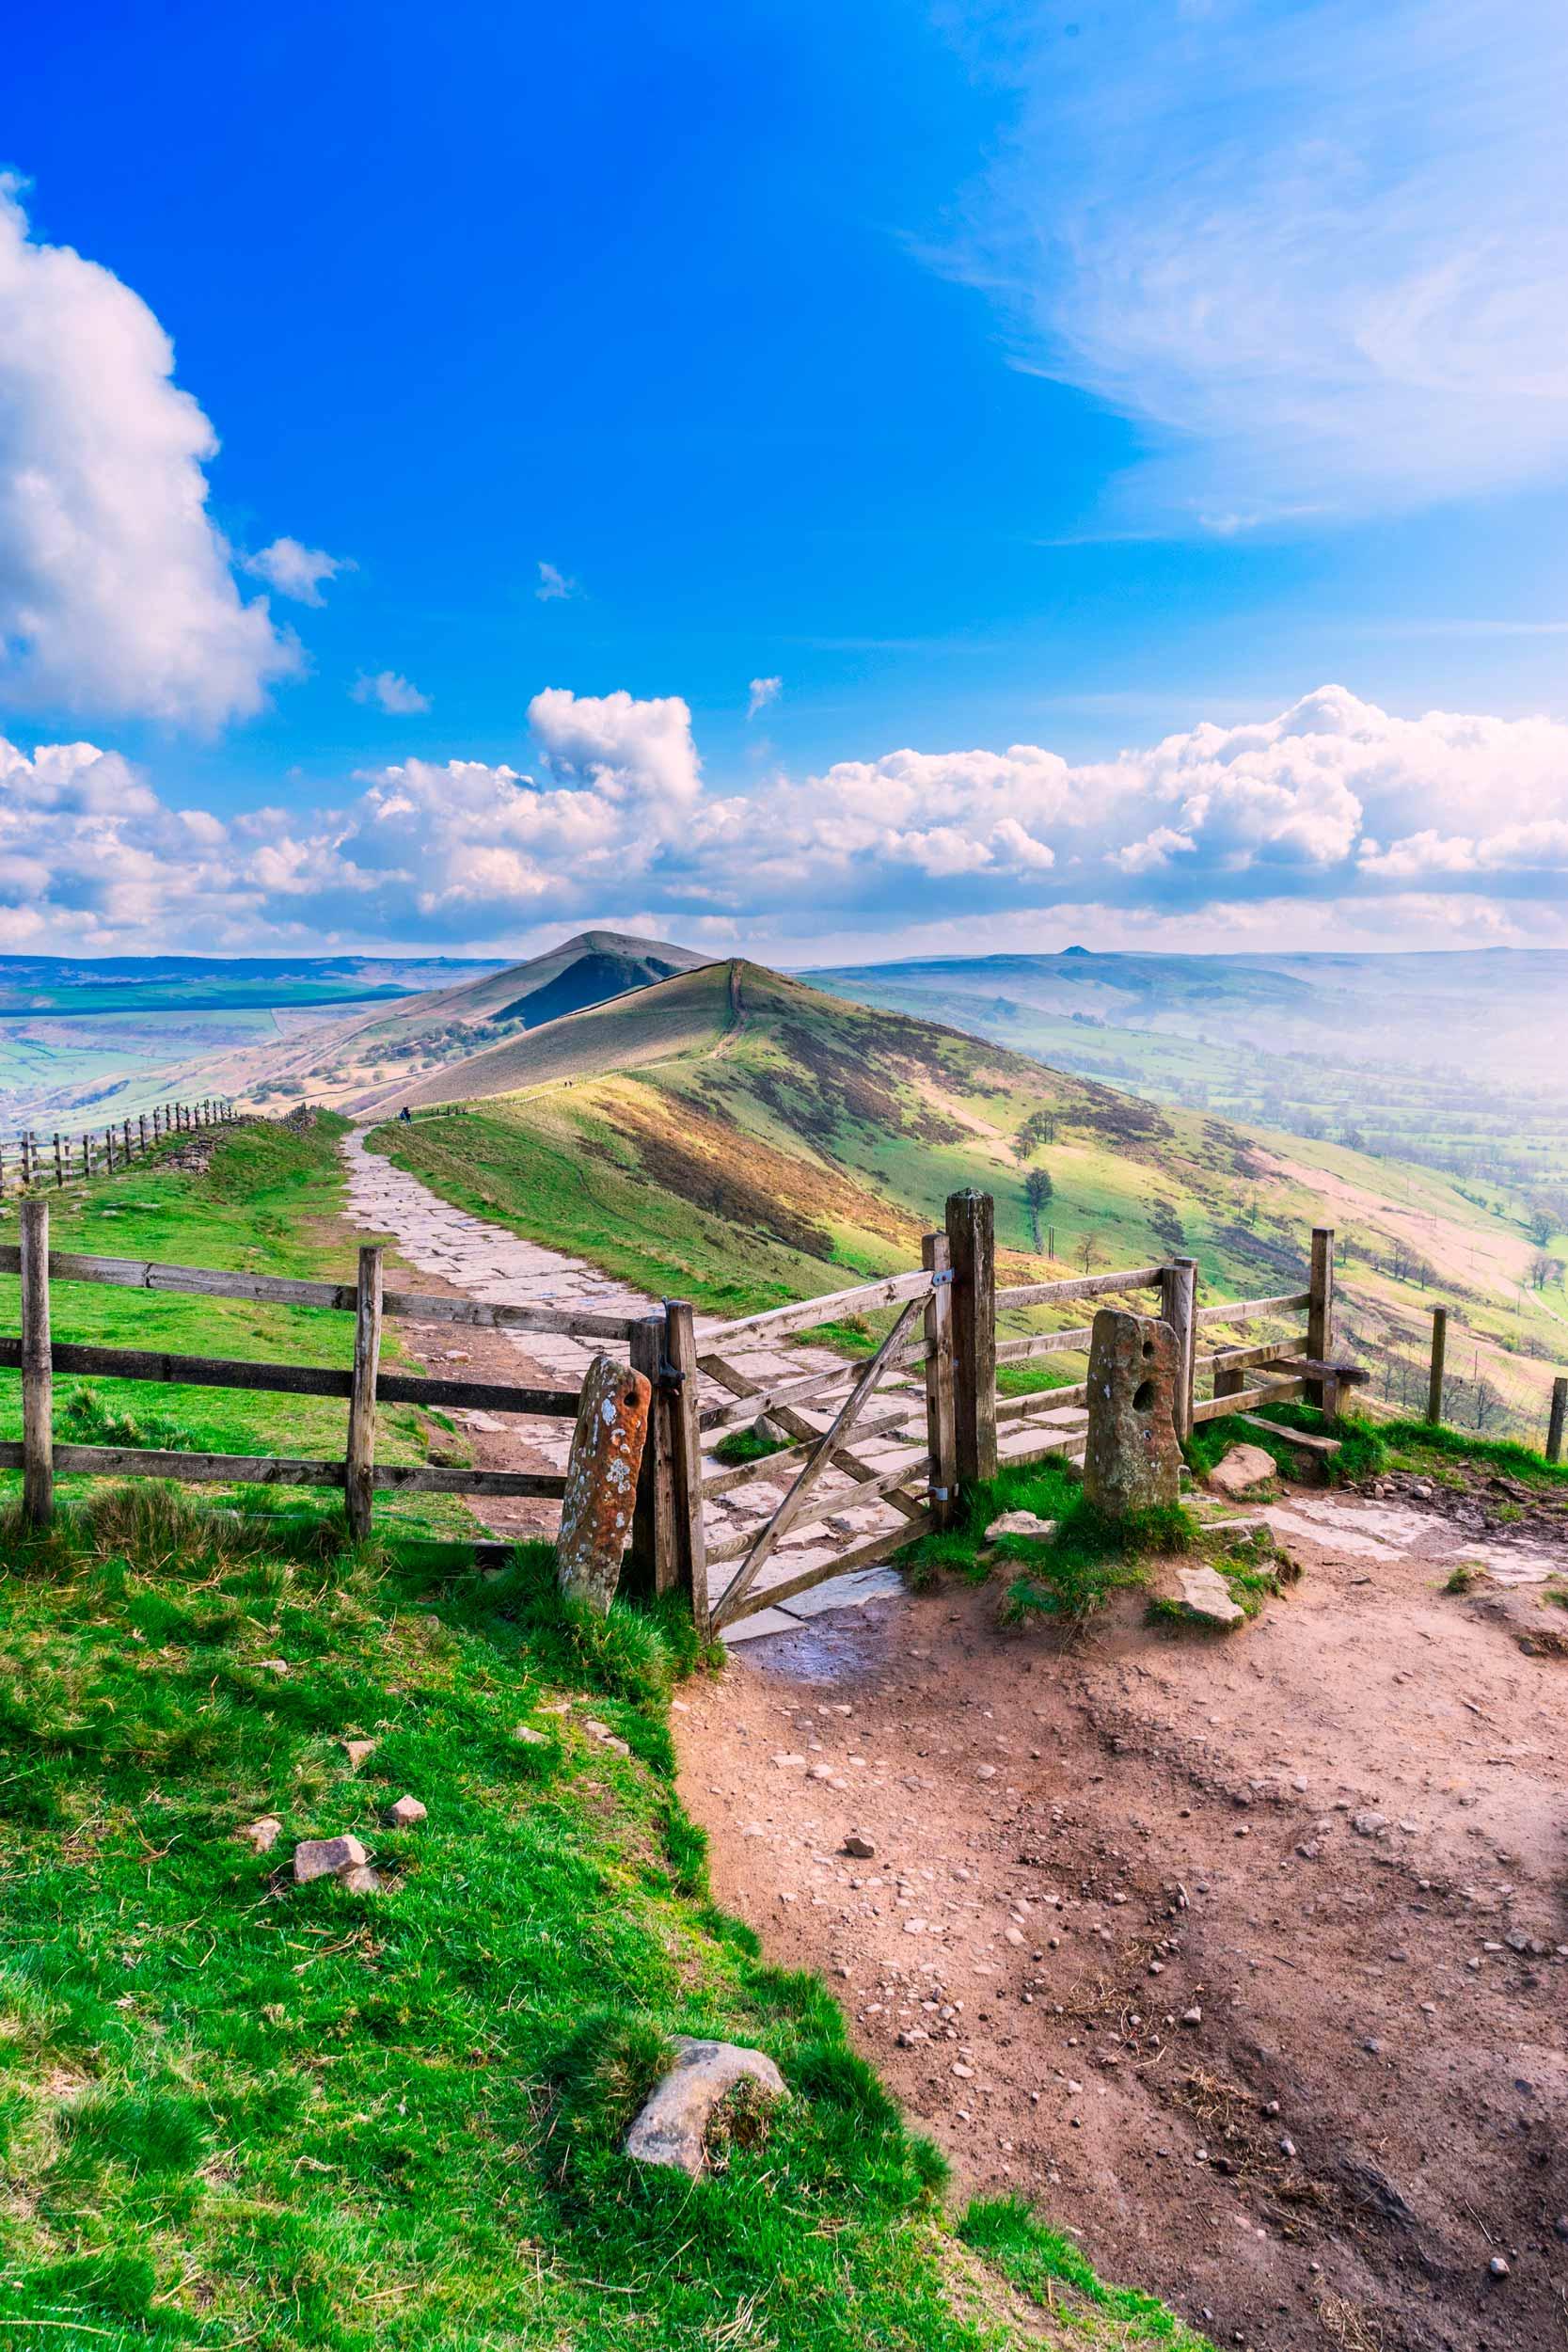 Mam Tor, Peak District - one of Britain's favourite views  (Gordon Bell/Shutterstock)